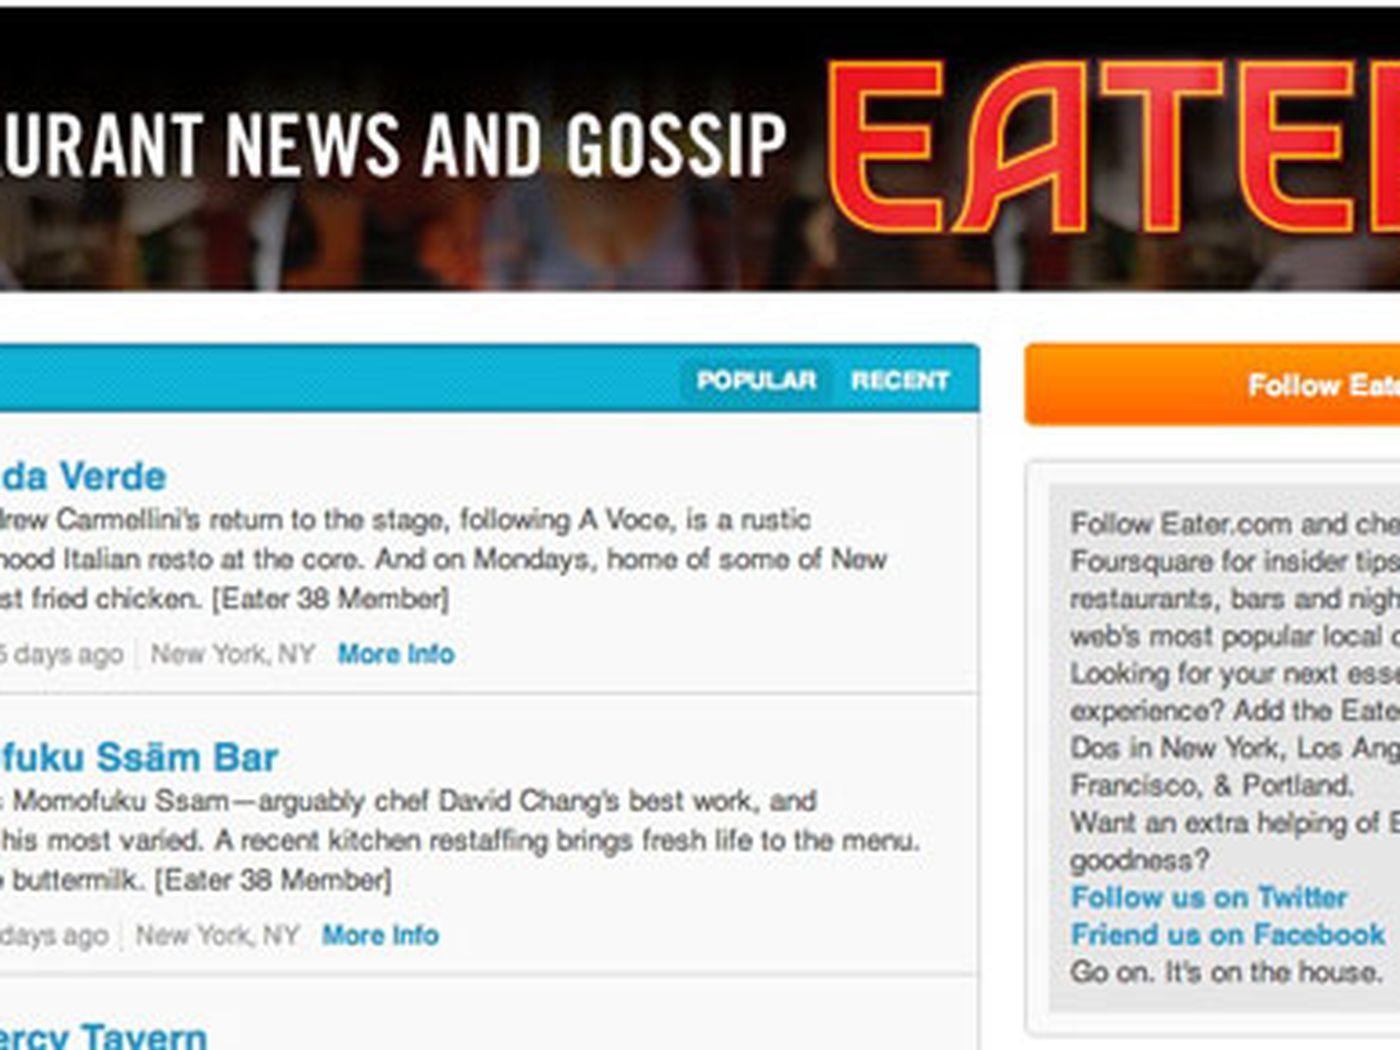 Follow Eater on Foursquare and Enjoy Endless Secret Intel